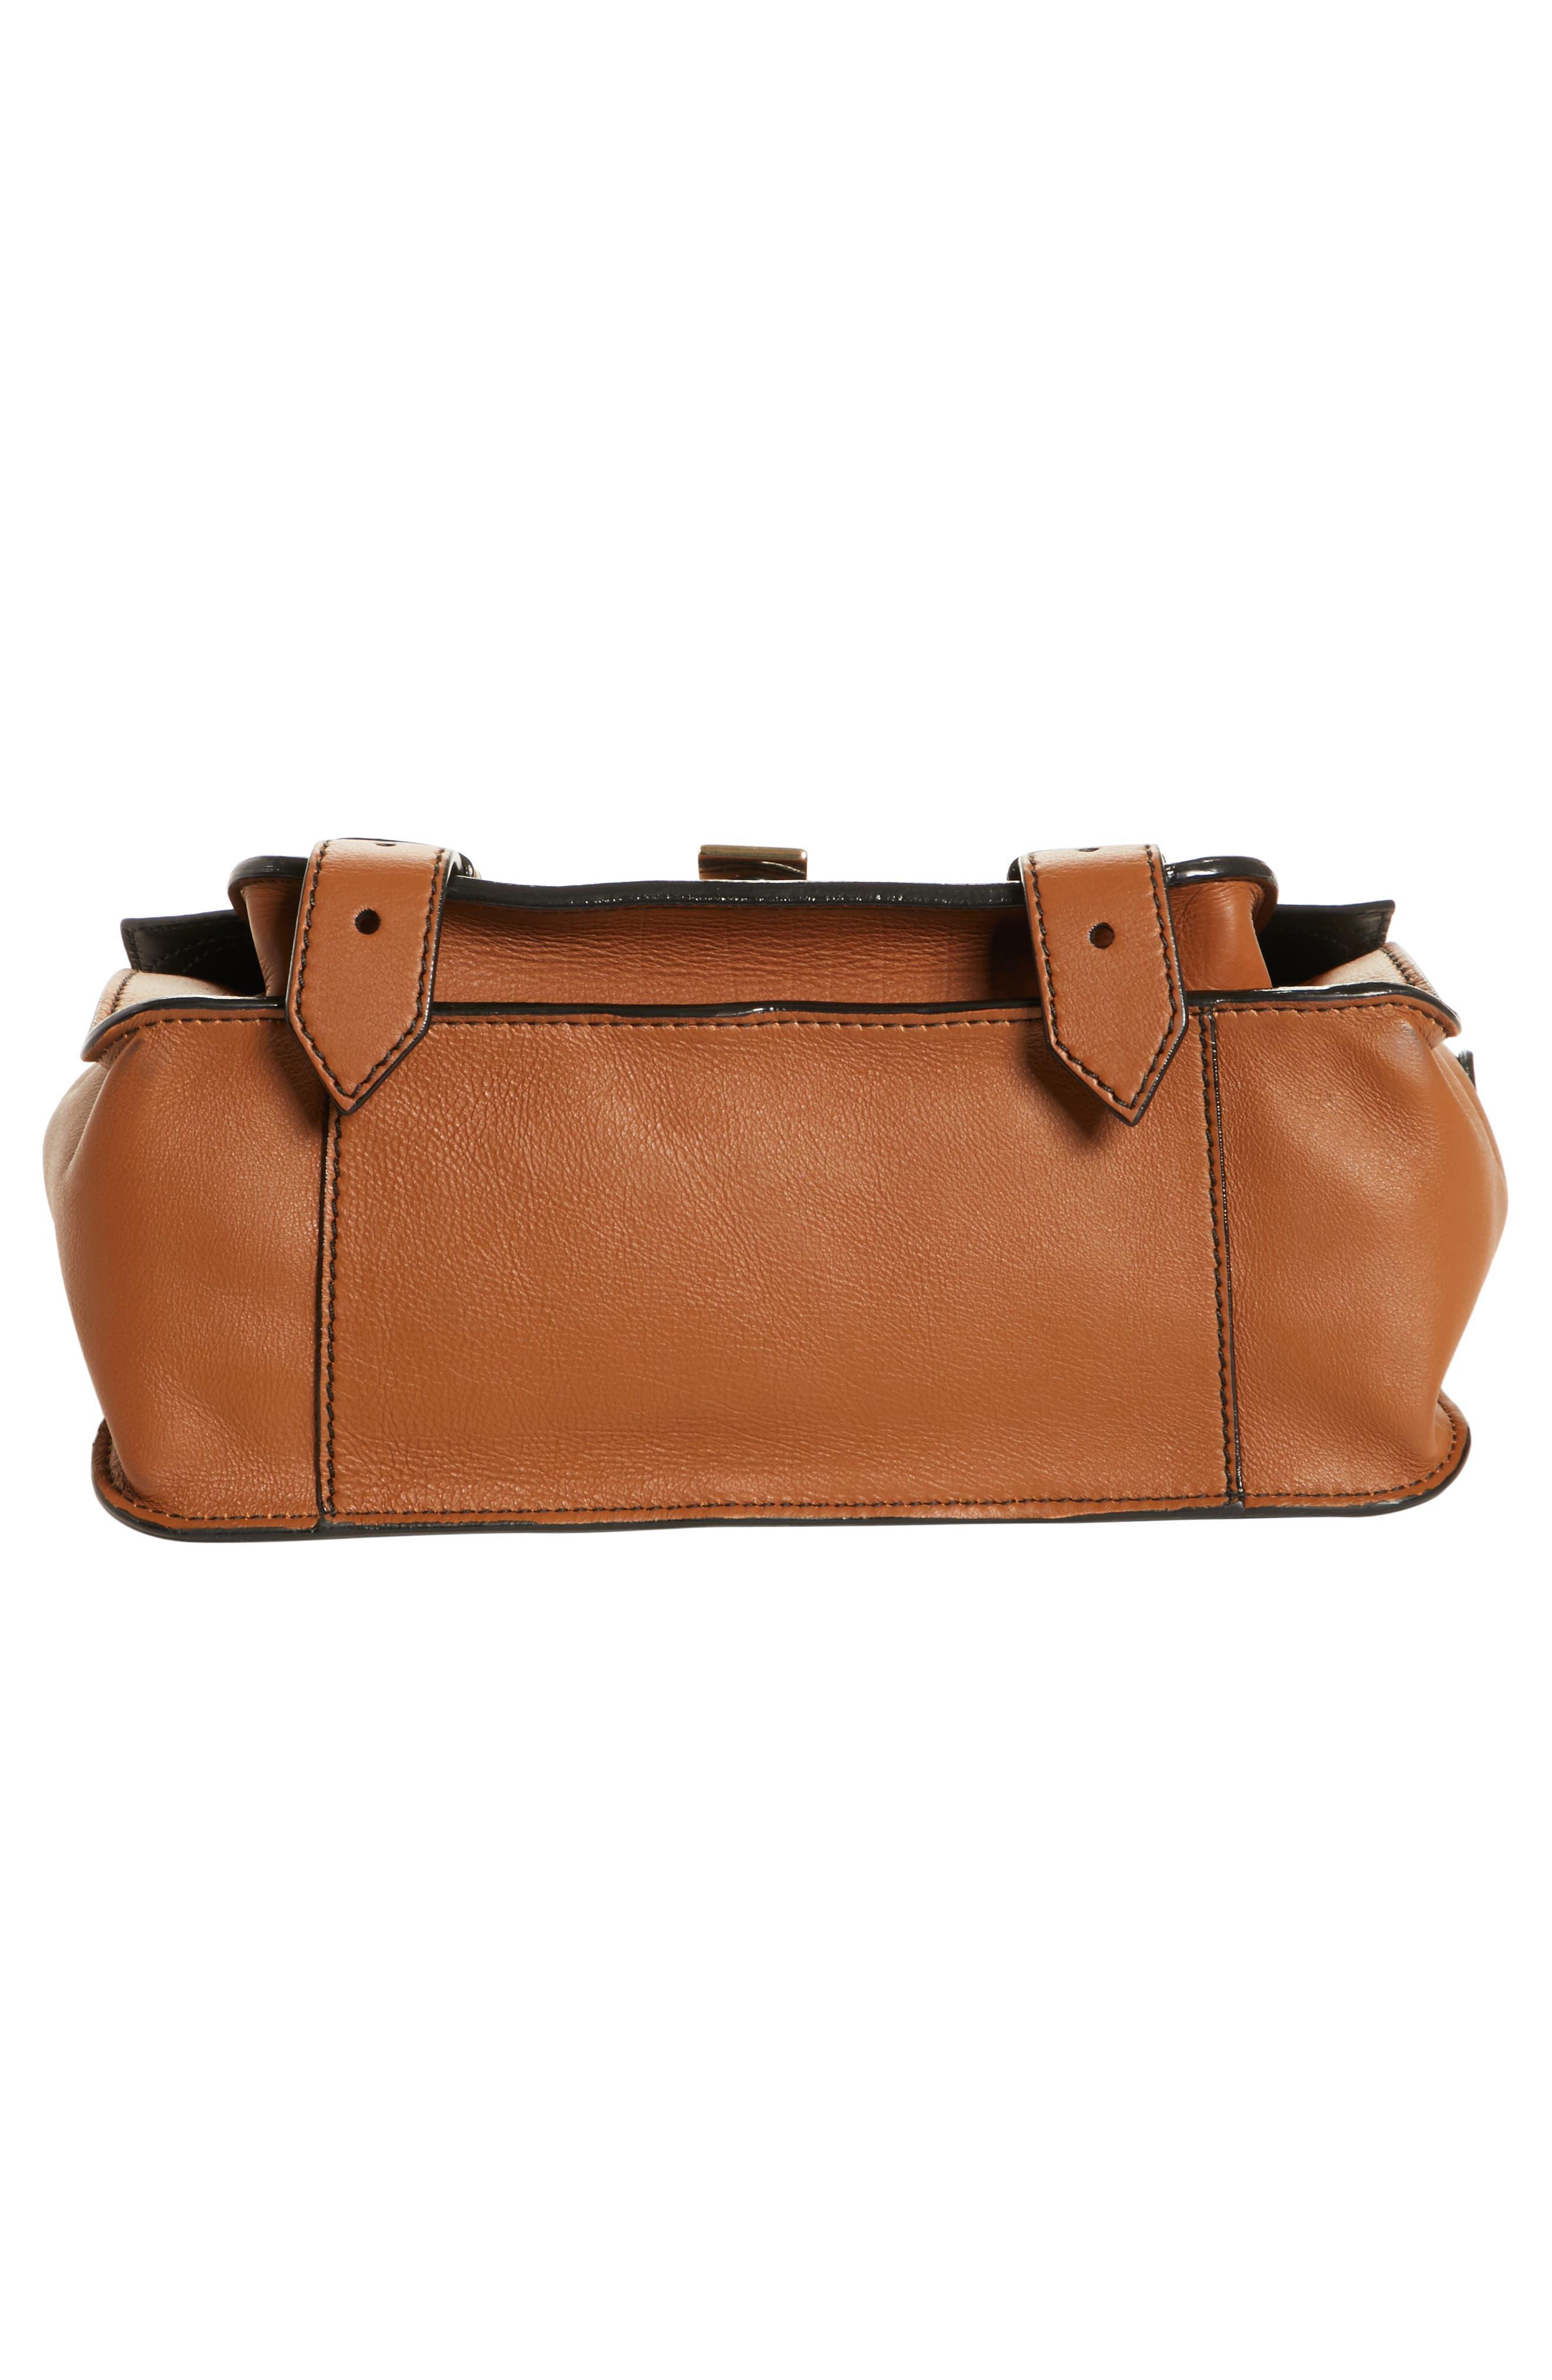 Tiny PS1 Grainy Leather Satchel,                             Alternate thumbnail 5, color,                             250